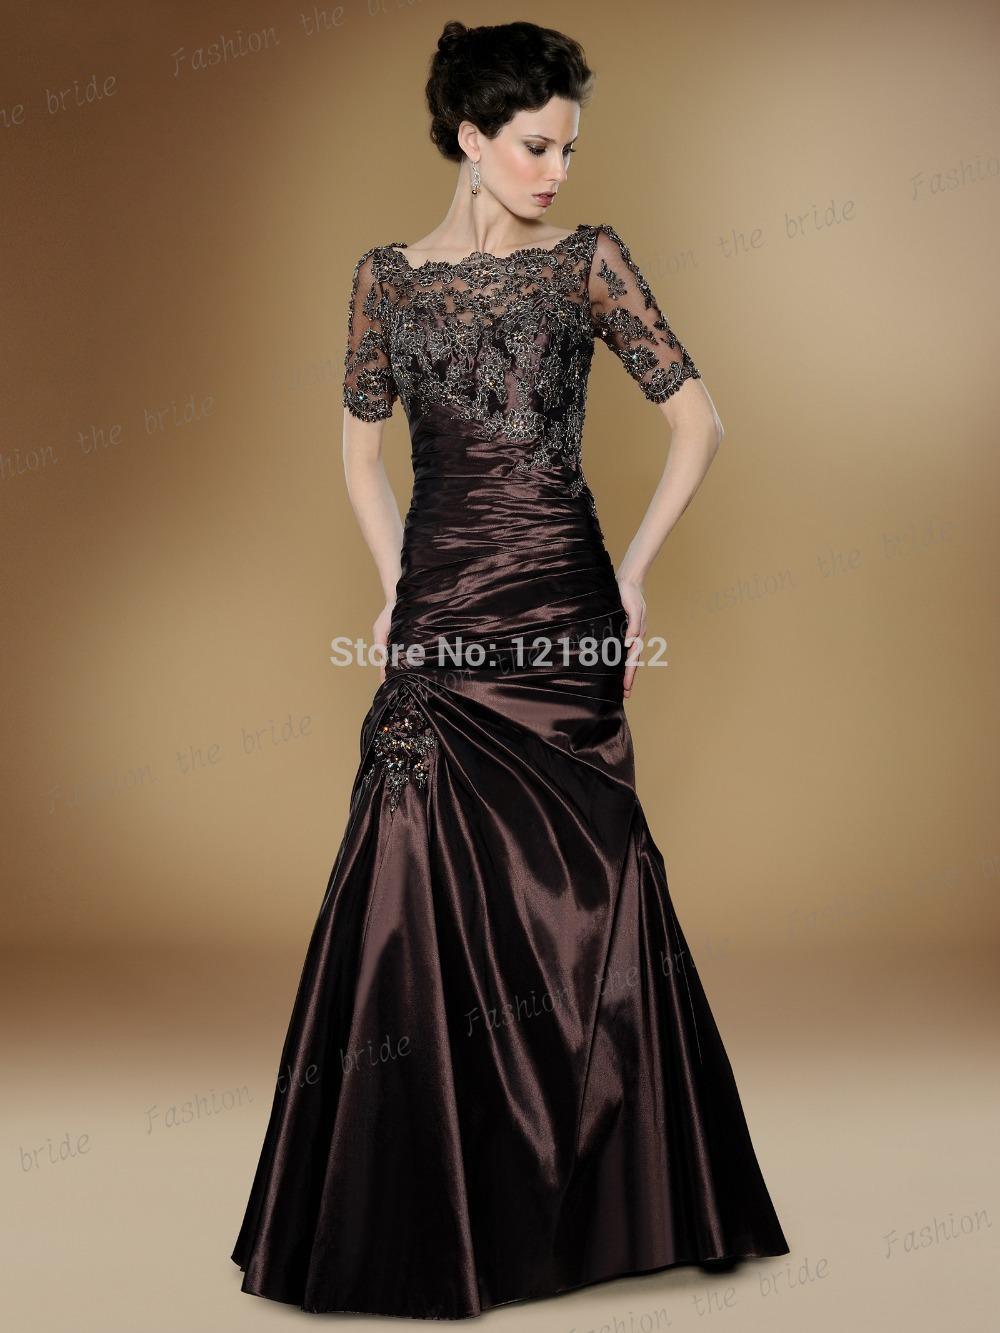 Maxi dress to wedding reception dress blog edin for Maxi dress for wedding reception